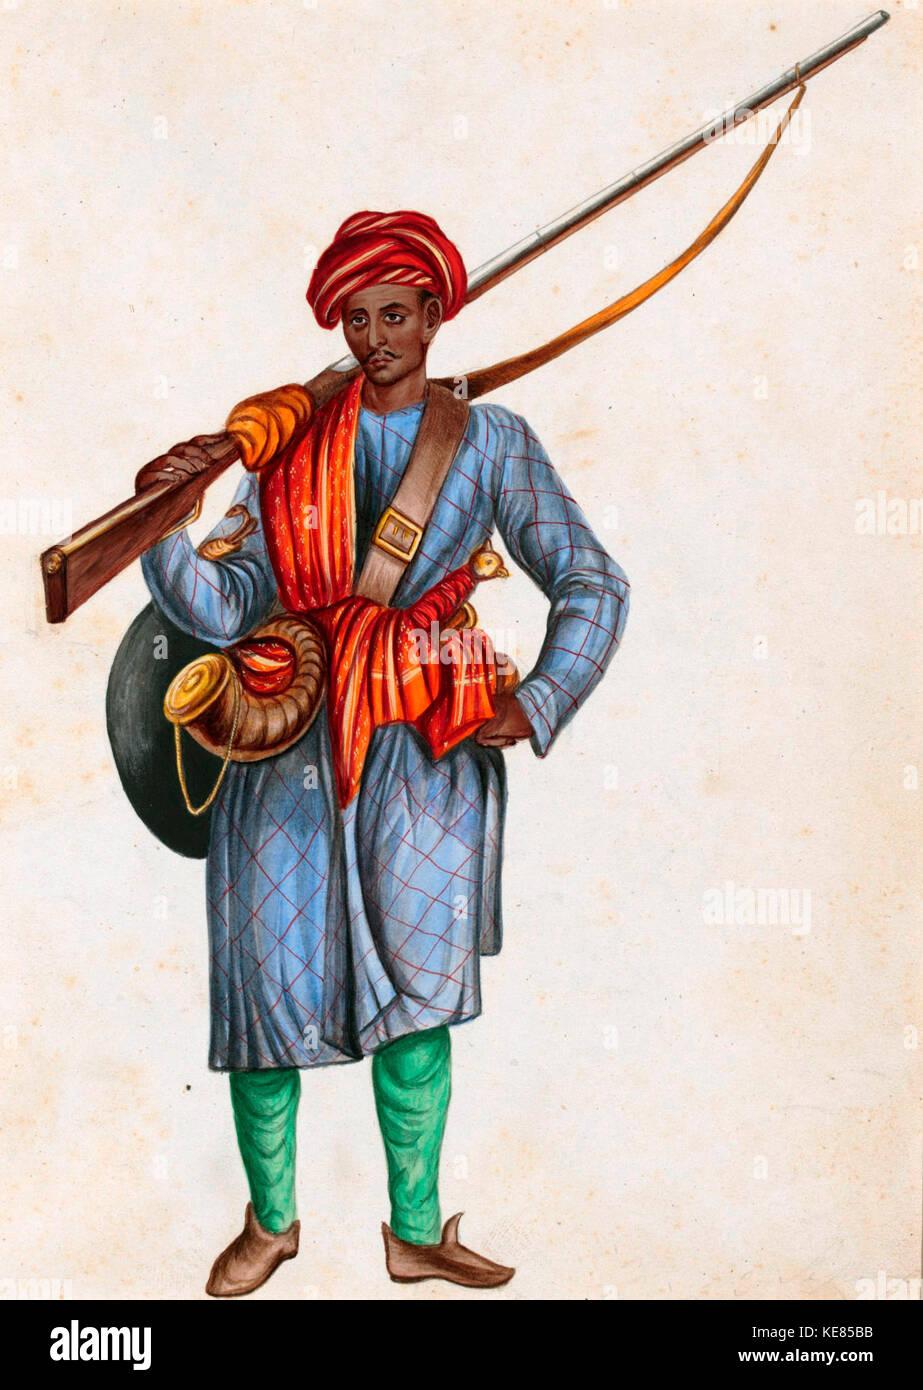 A painting of a Mughal Infantryman, circa 1850 - Stock Image